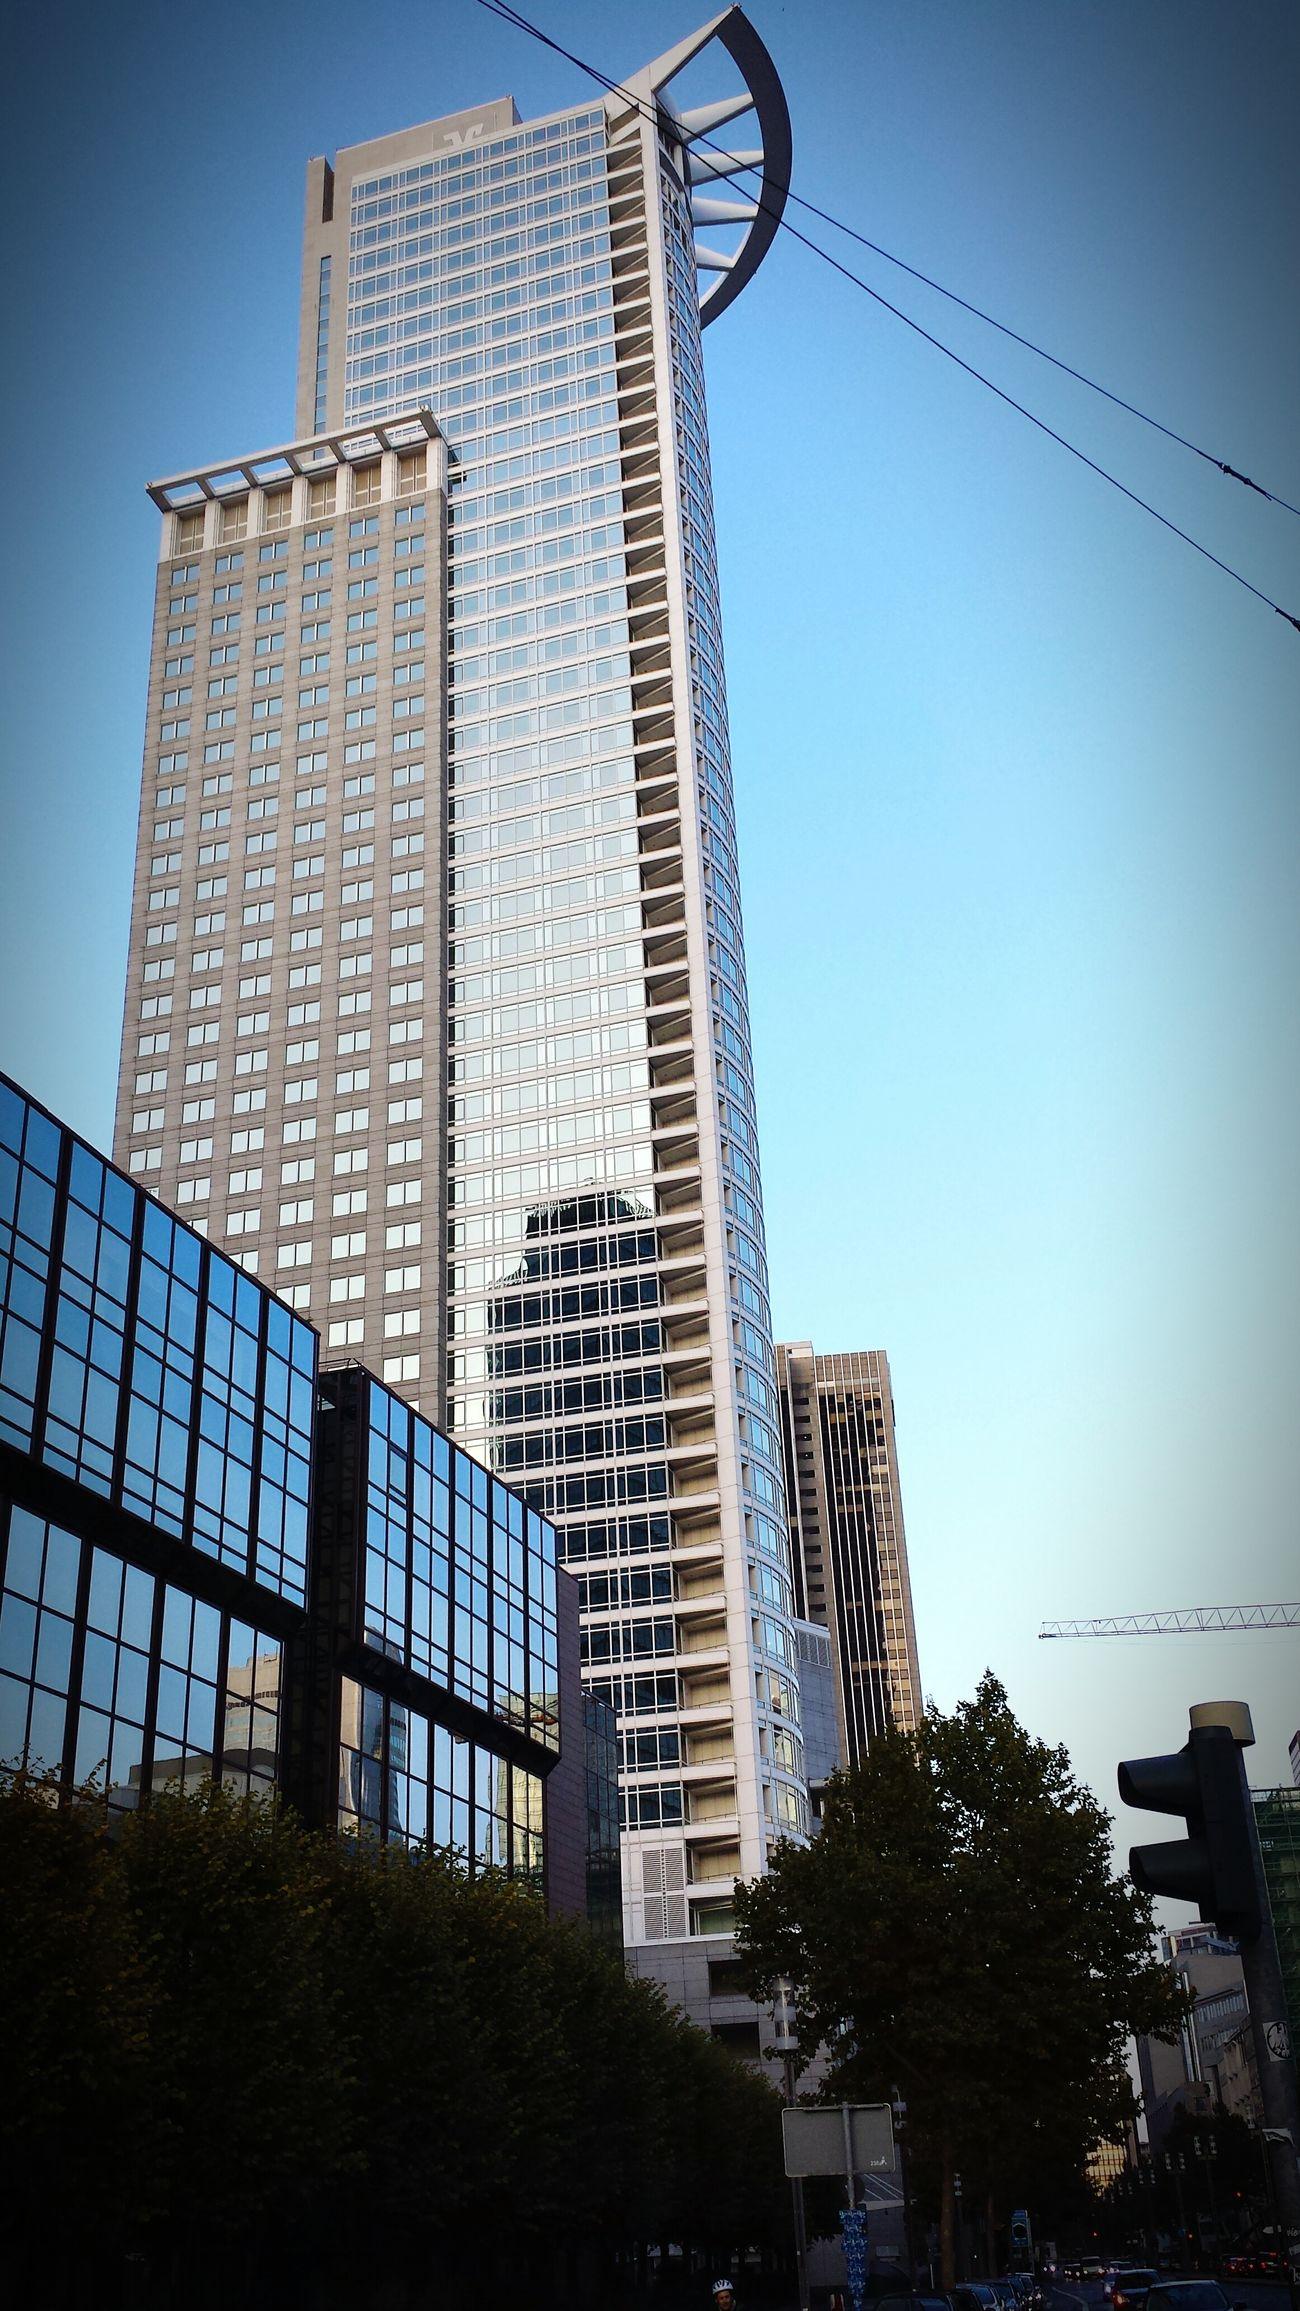 Frankfurt Bankenviertel Neetes Nikon Good Morning World!